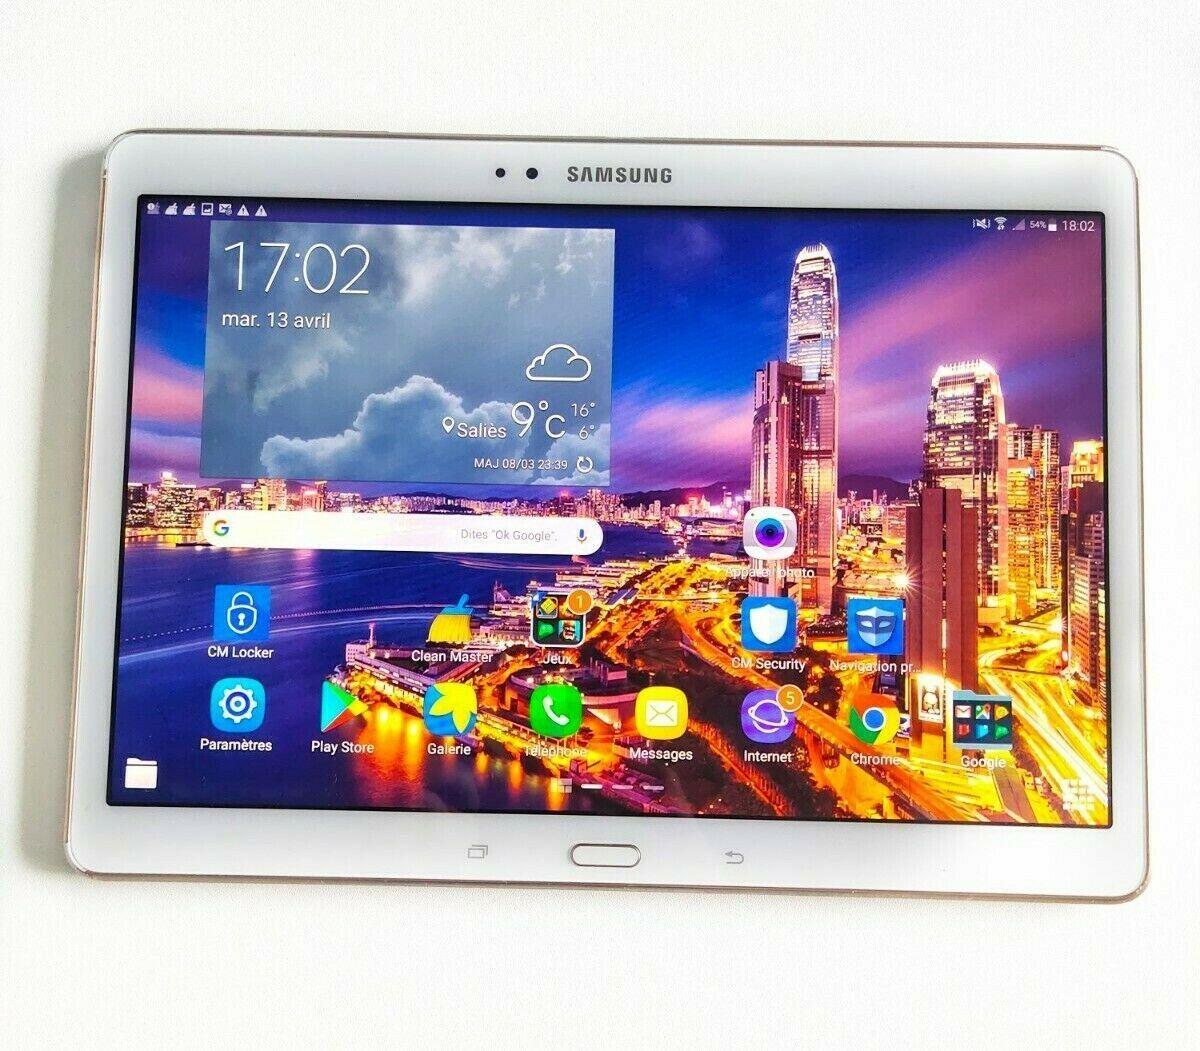 Samsung galaxy tab s - 4 g 32 go wifi android blanc tablette - avec port sim